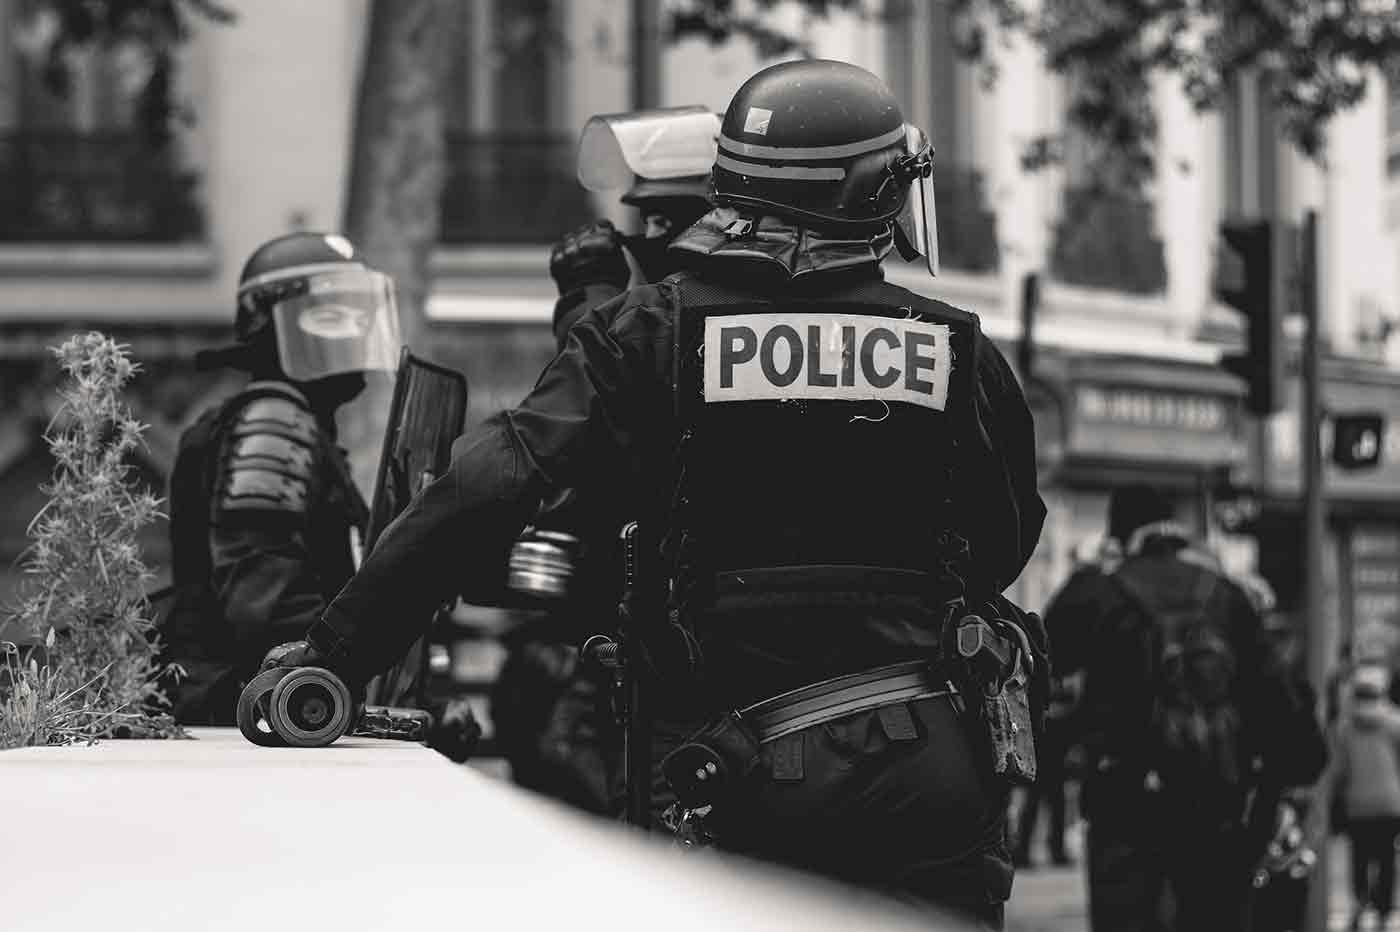 Siri Apple police interpellation